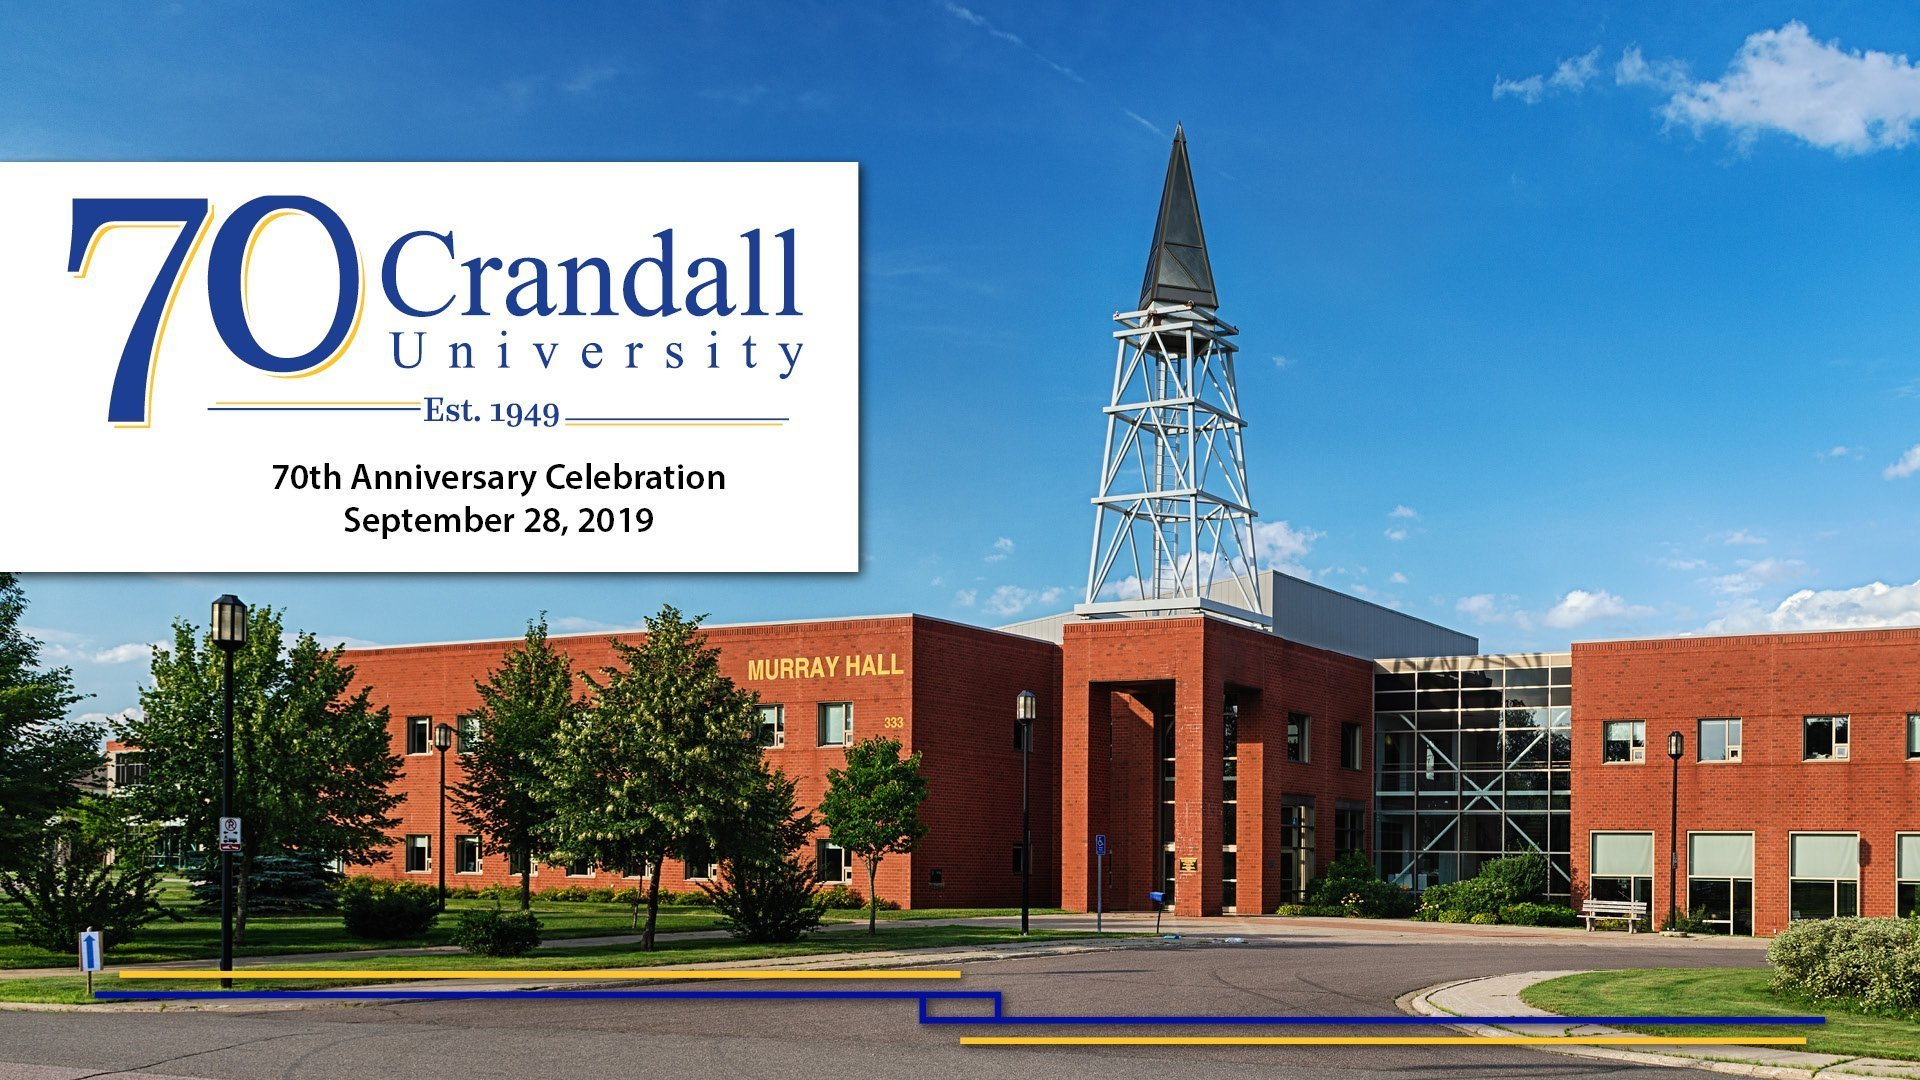 Crandall University 70th Anniversary Celebration